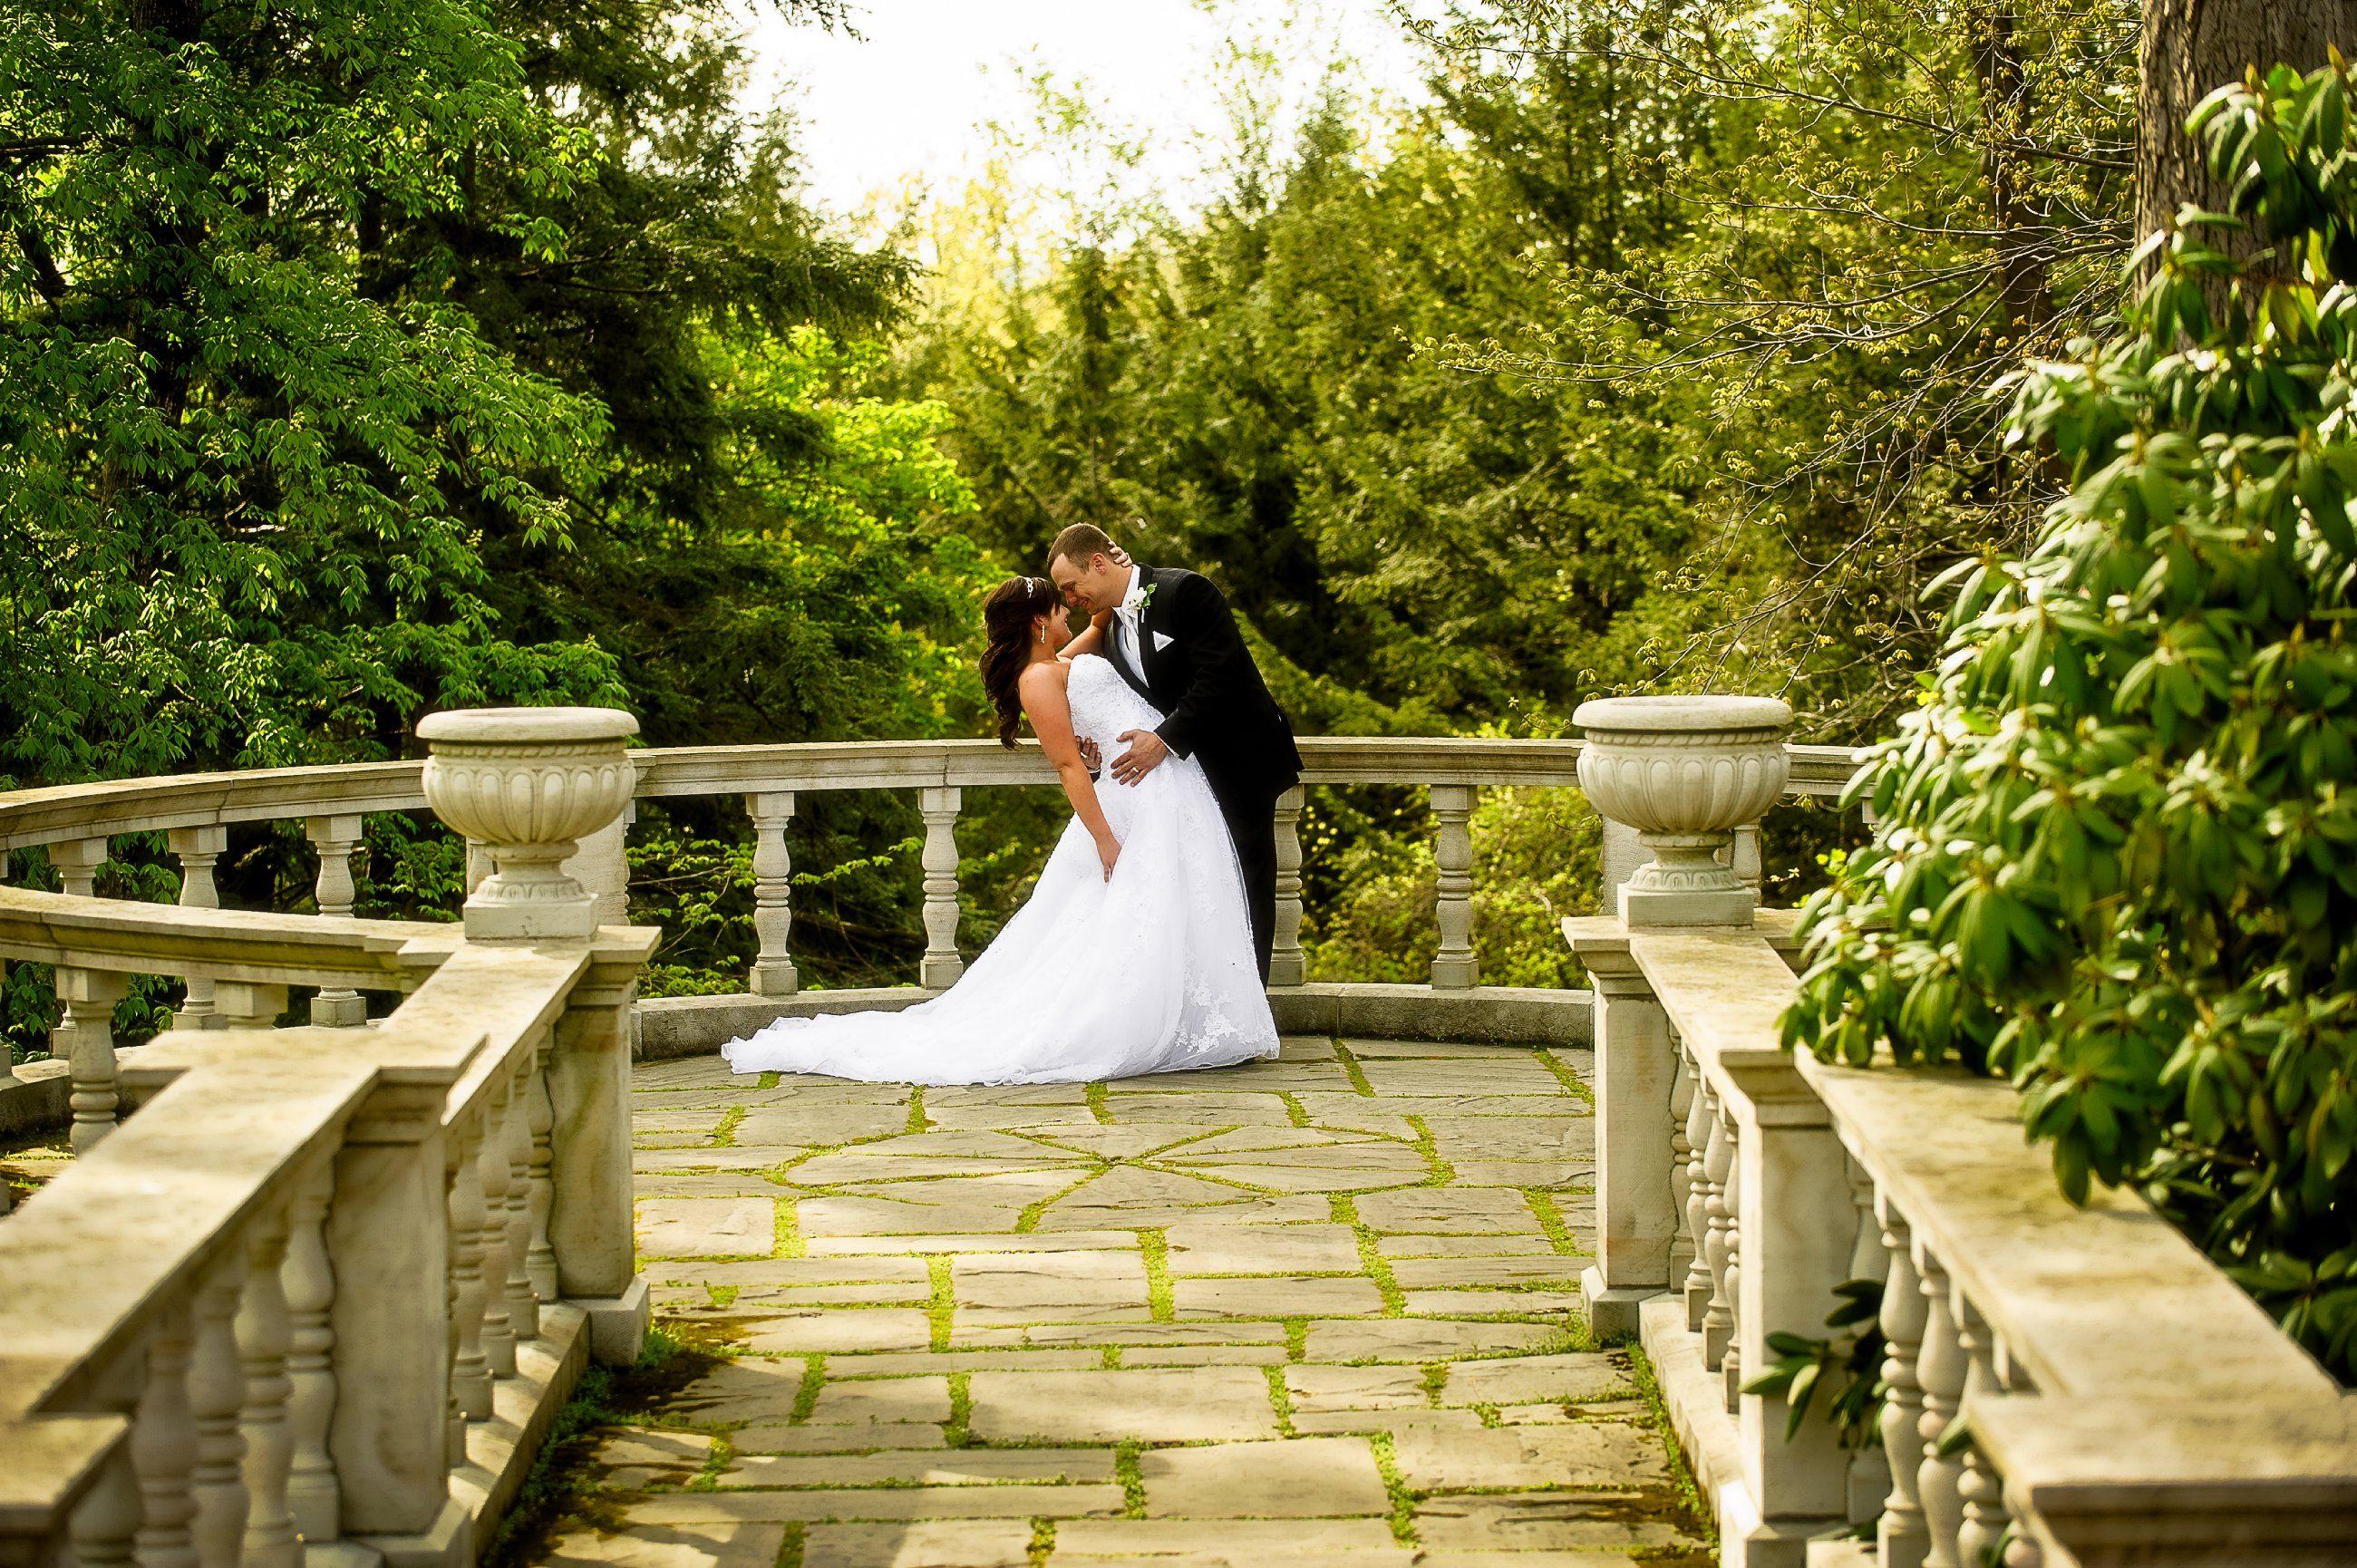 outdoor wedding ceremony sites in akron ohio%0A stan hywet wedding photos  Google Search    Wedding PhotosPhoto Ideas